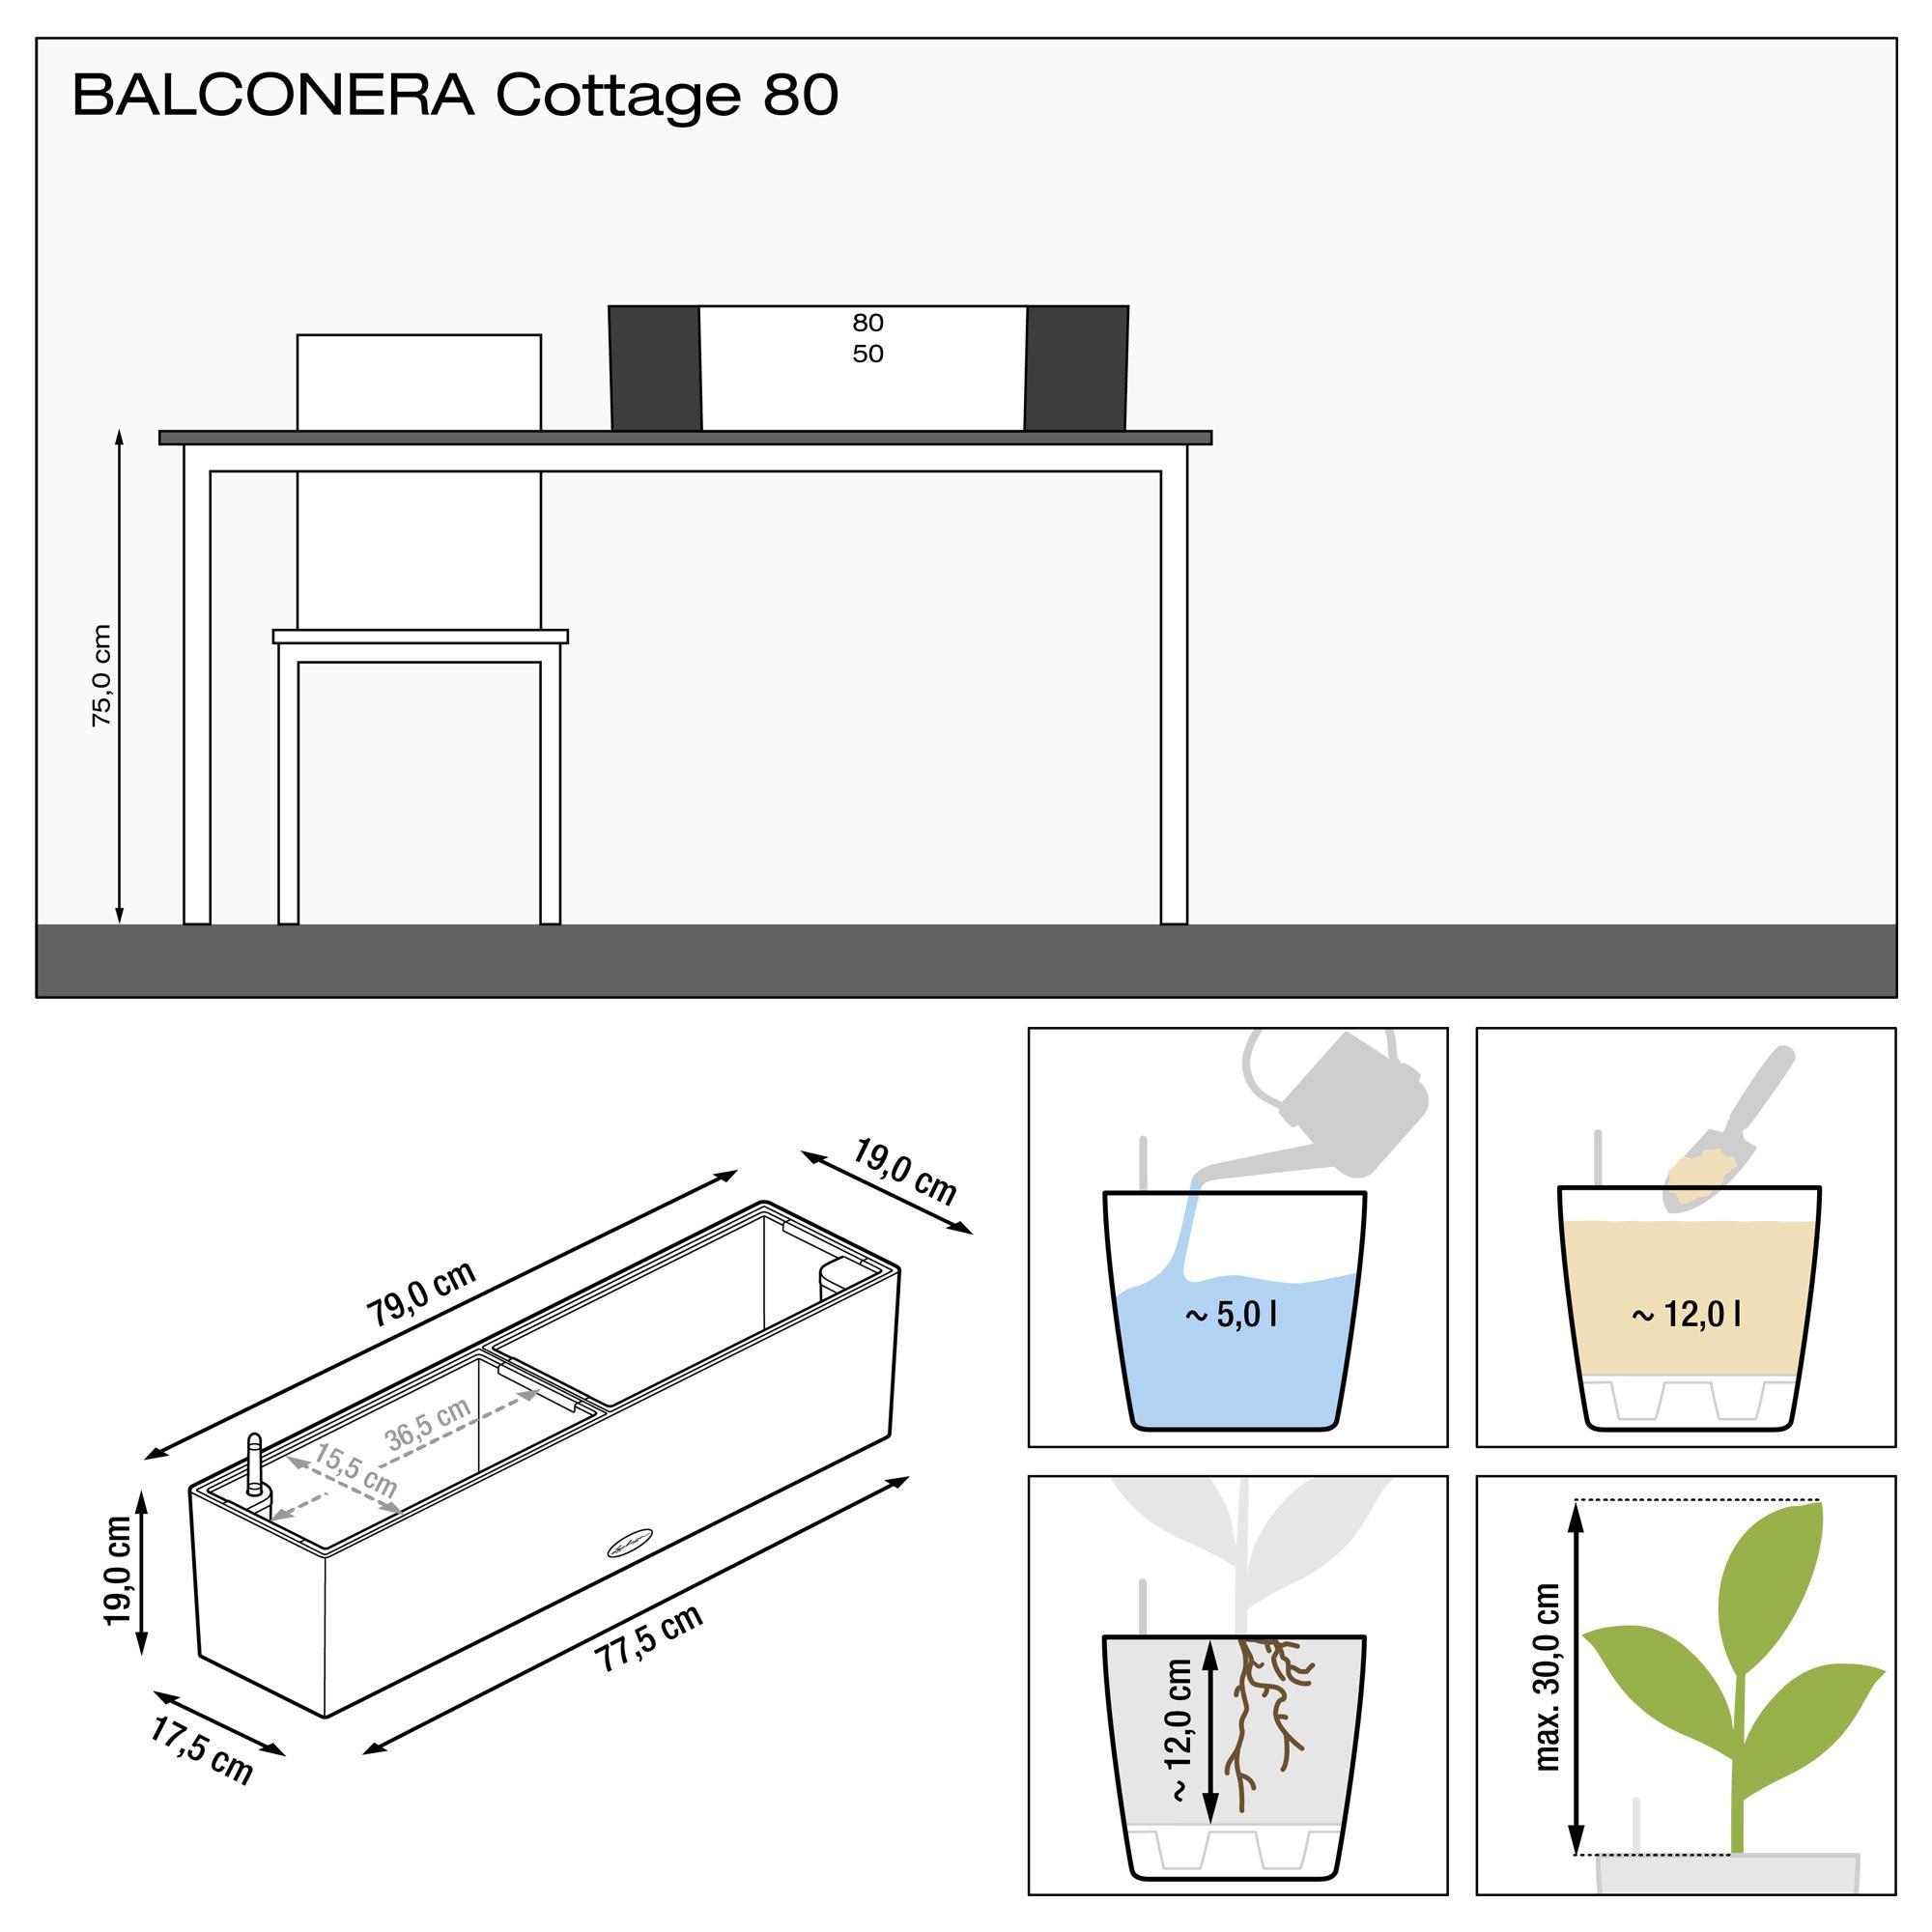 BALCONERA Cottage 80 granite - Image 3